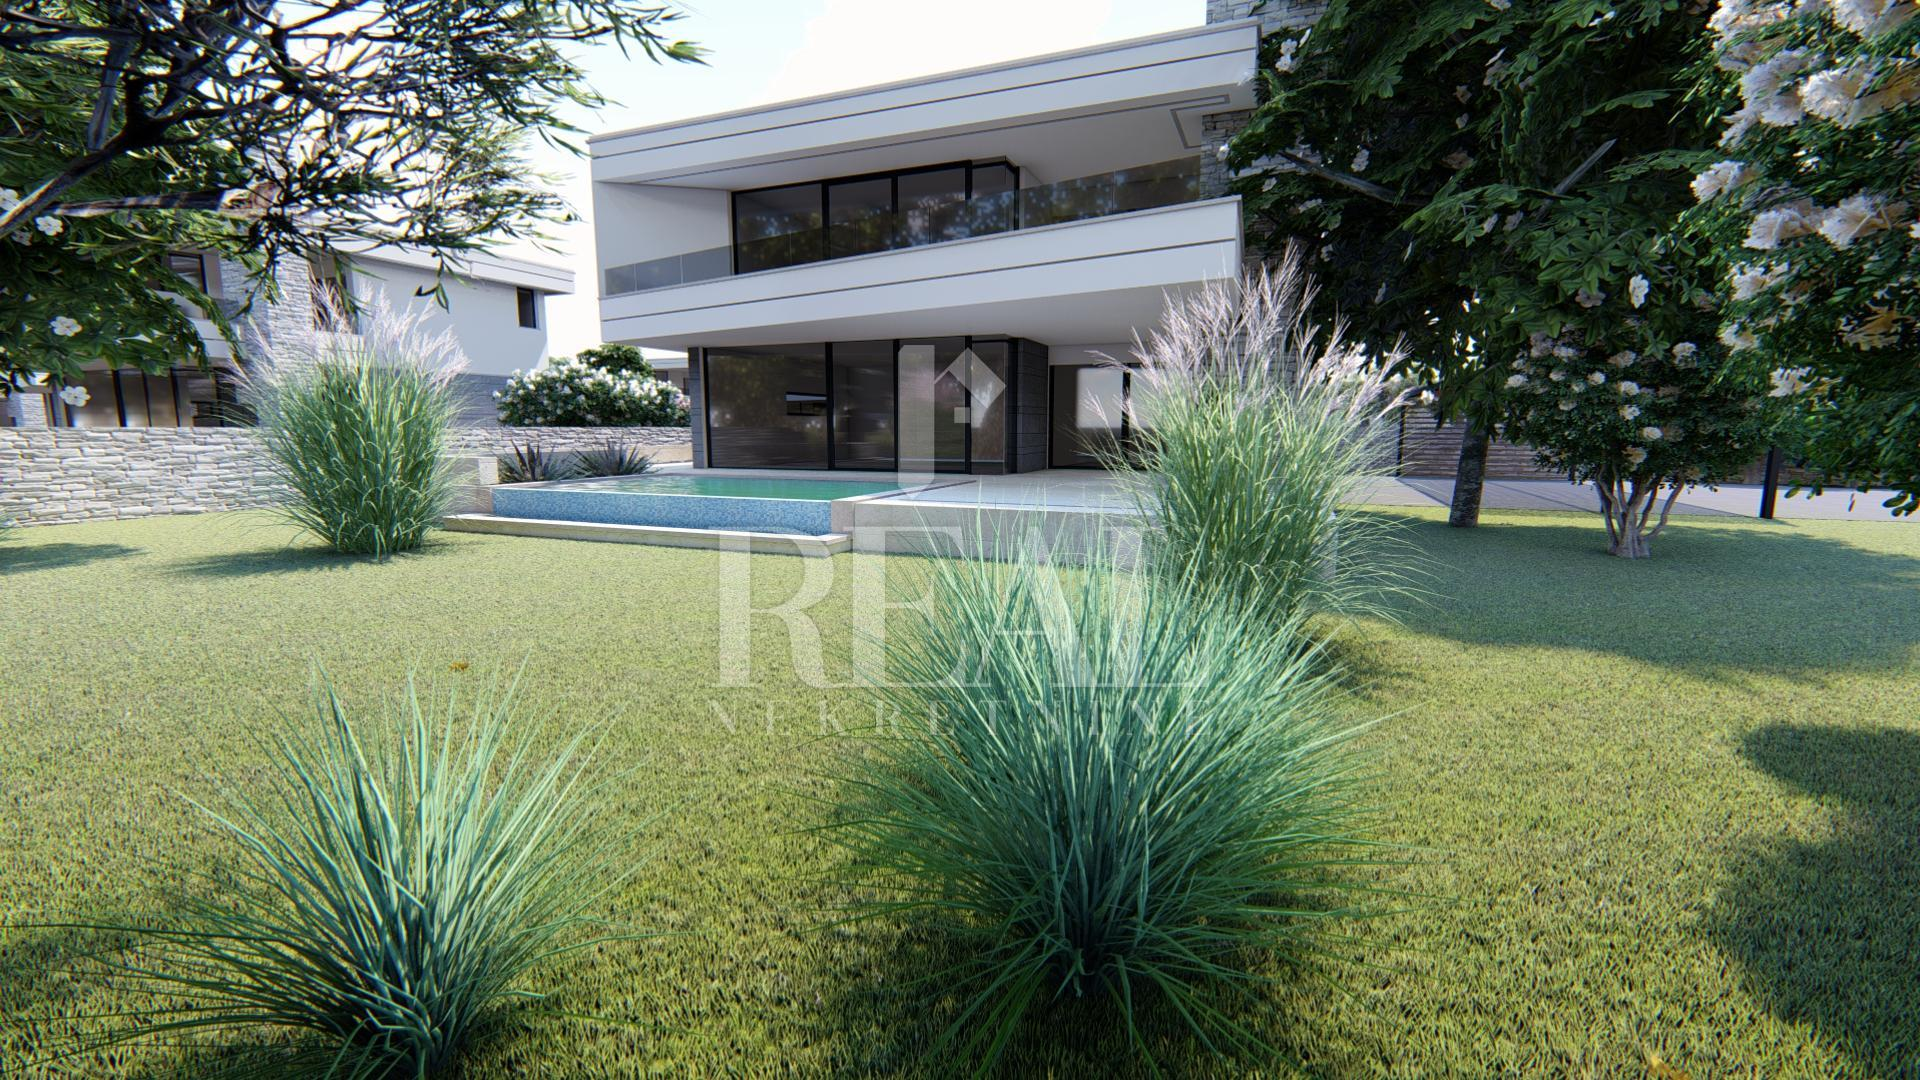 Građevinsko zemljište od 8000 m2 za gradnju 10 vila s bazenima